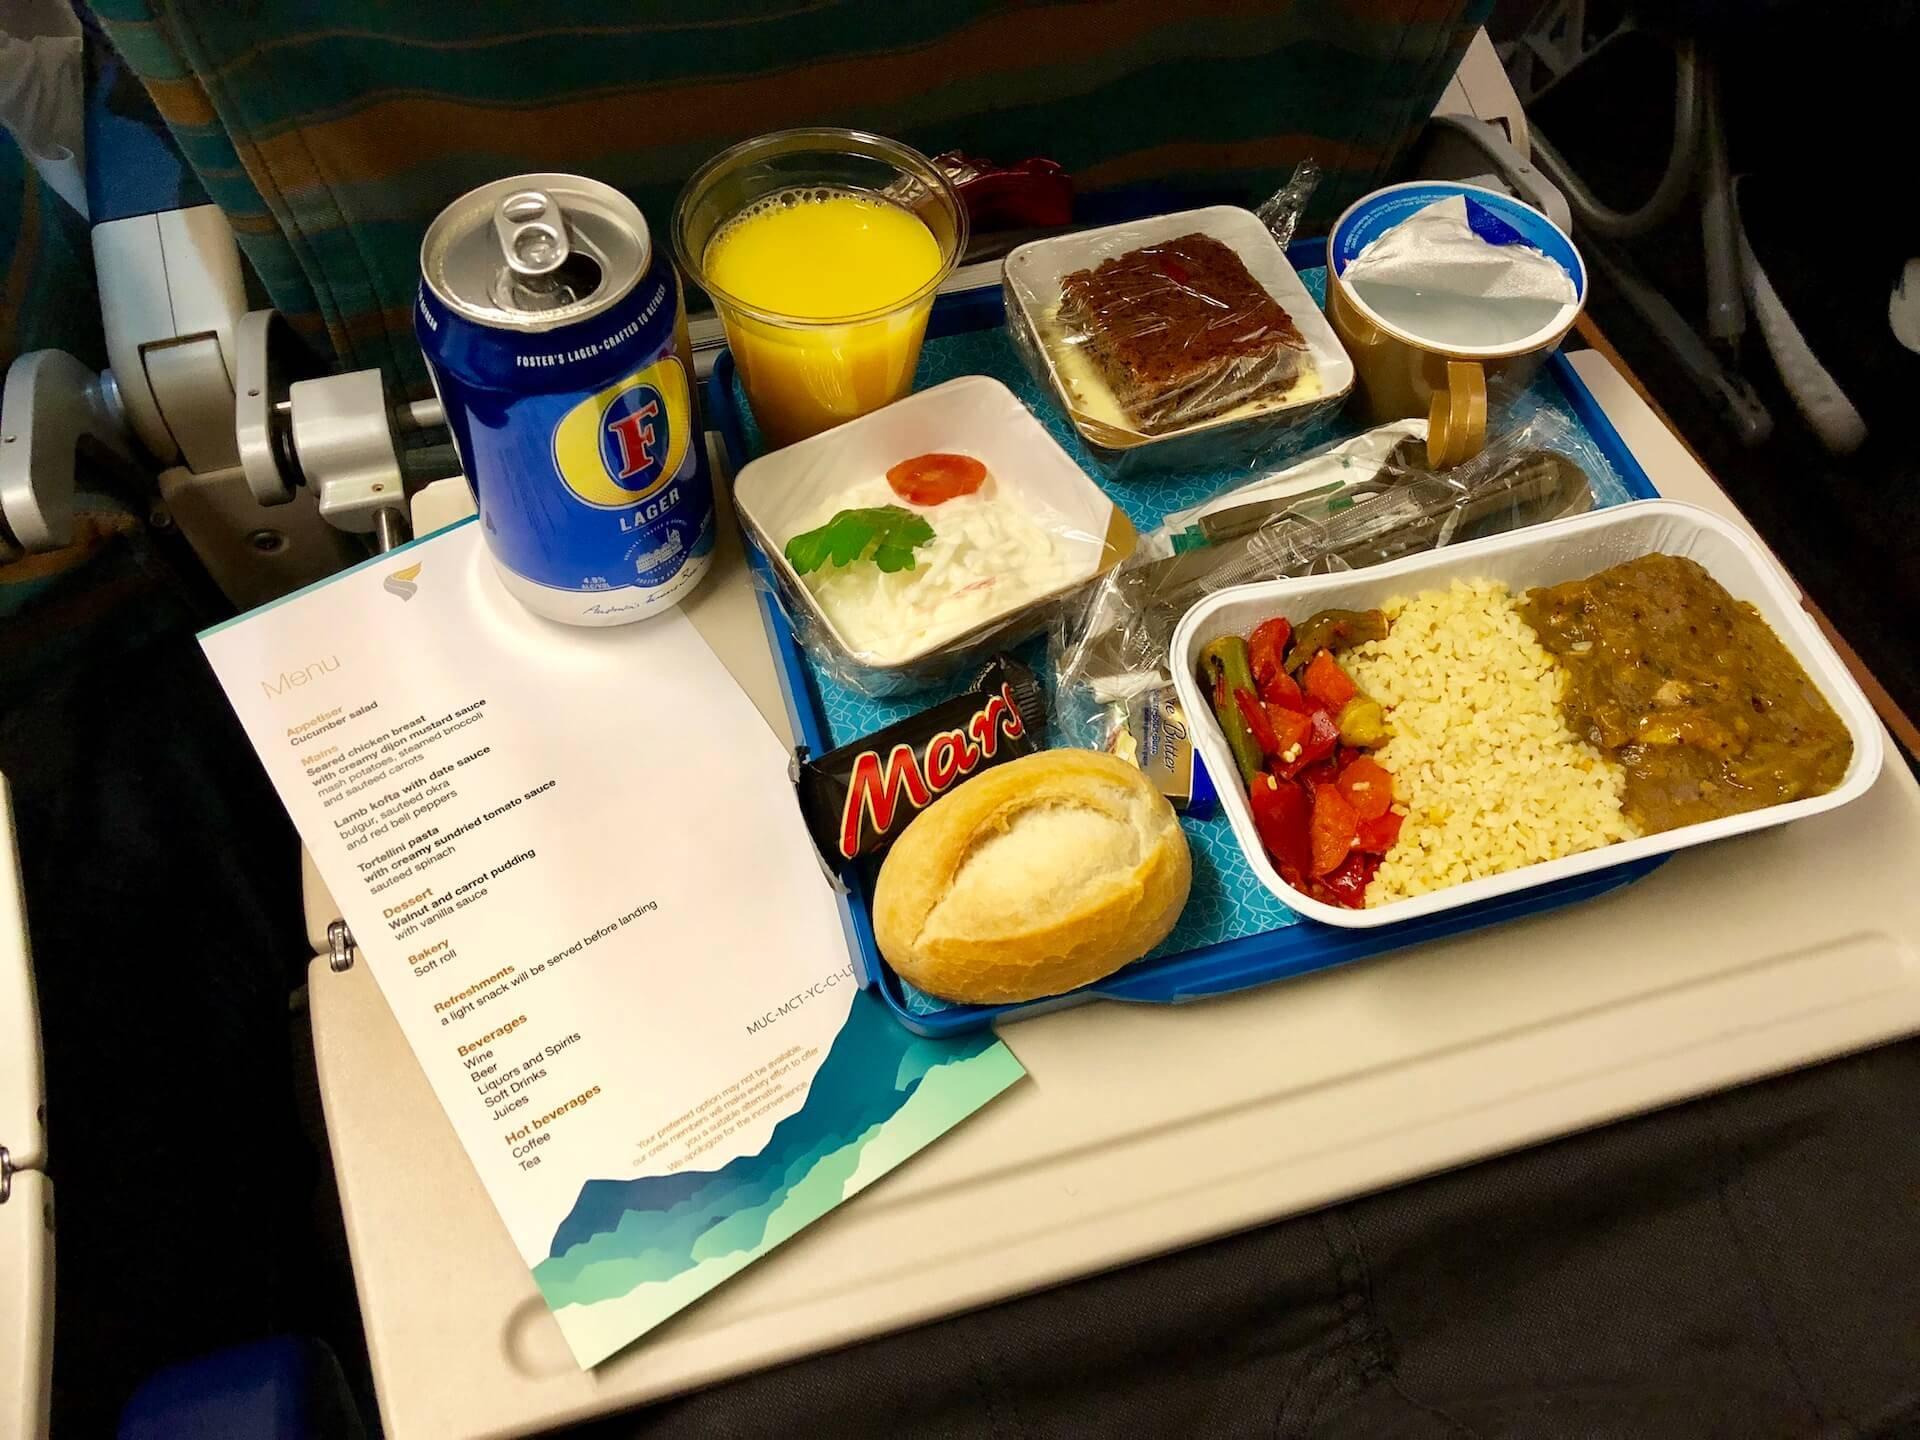 Oman Air Economy Class Essen